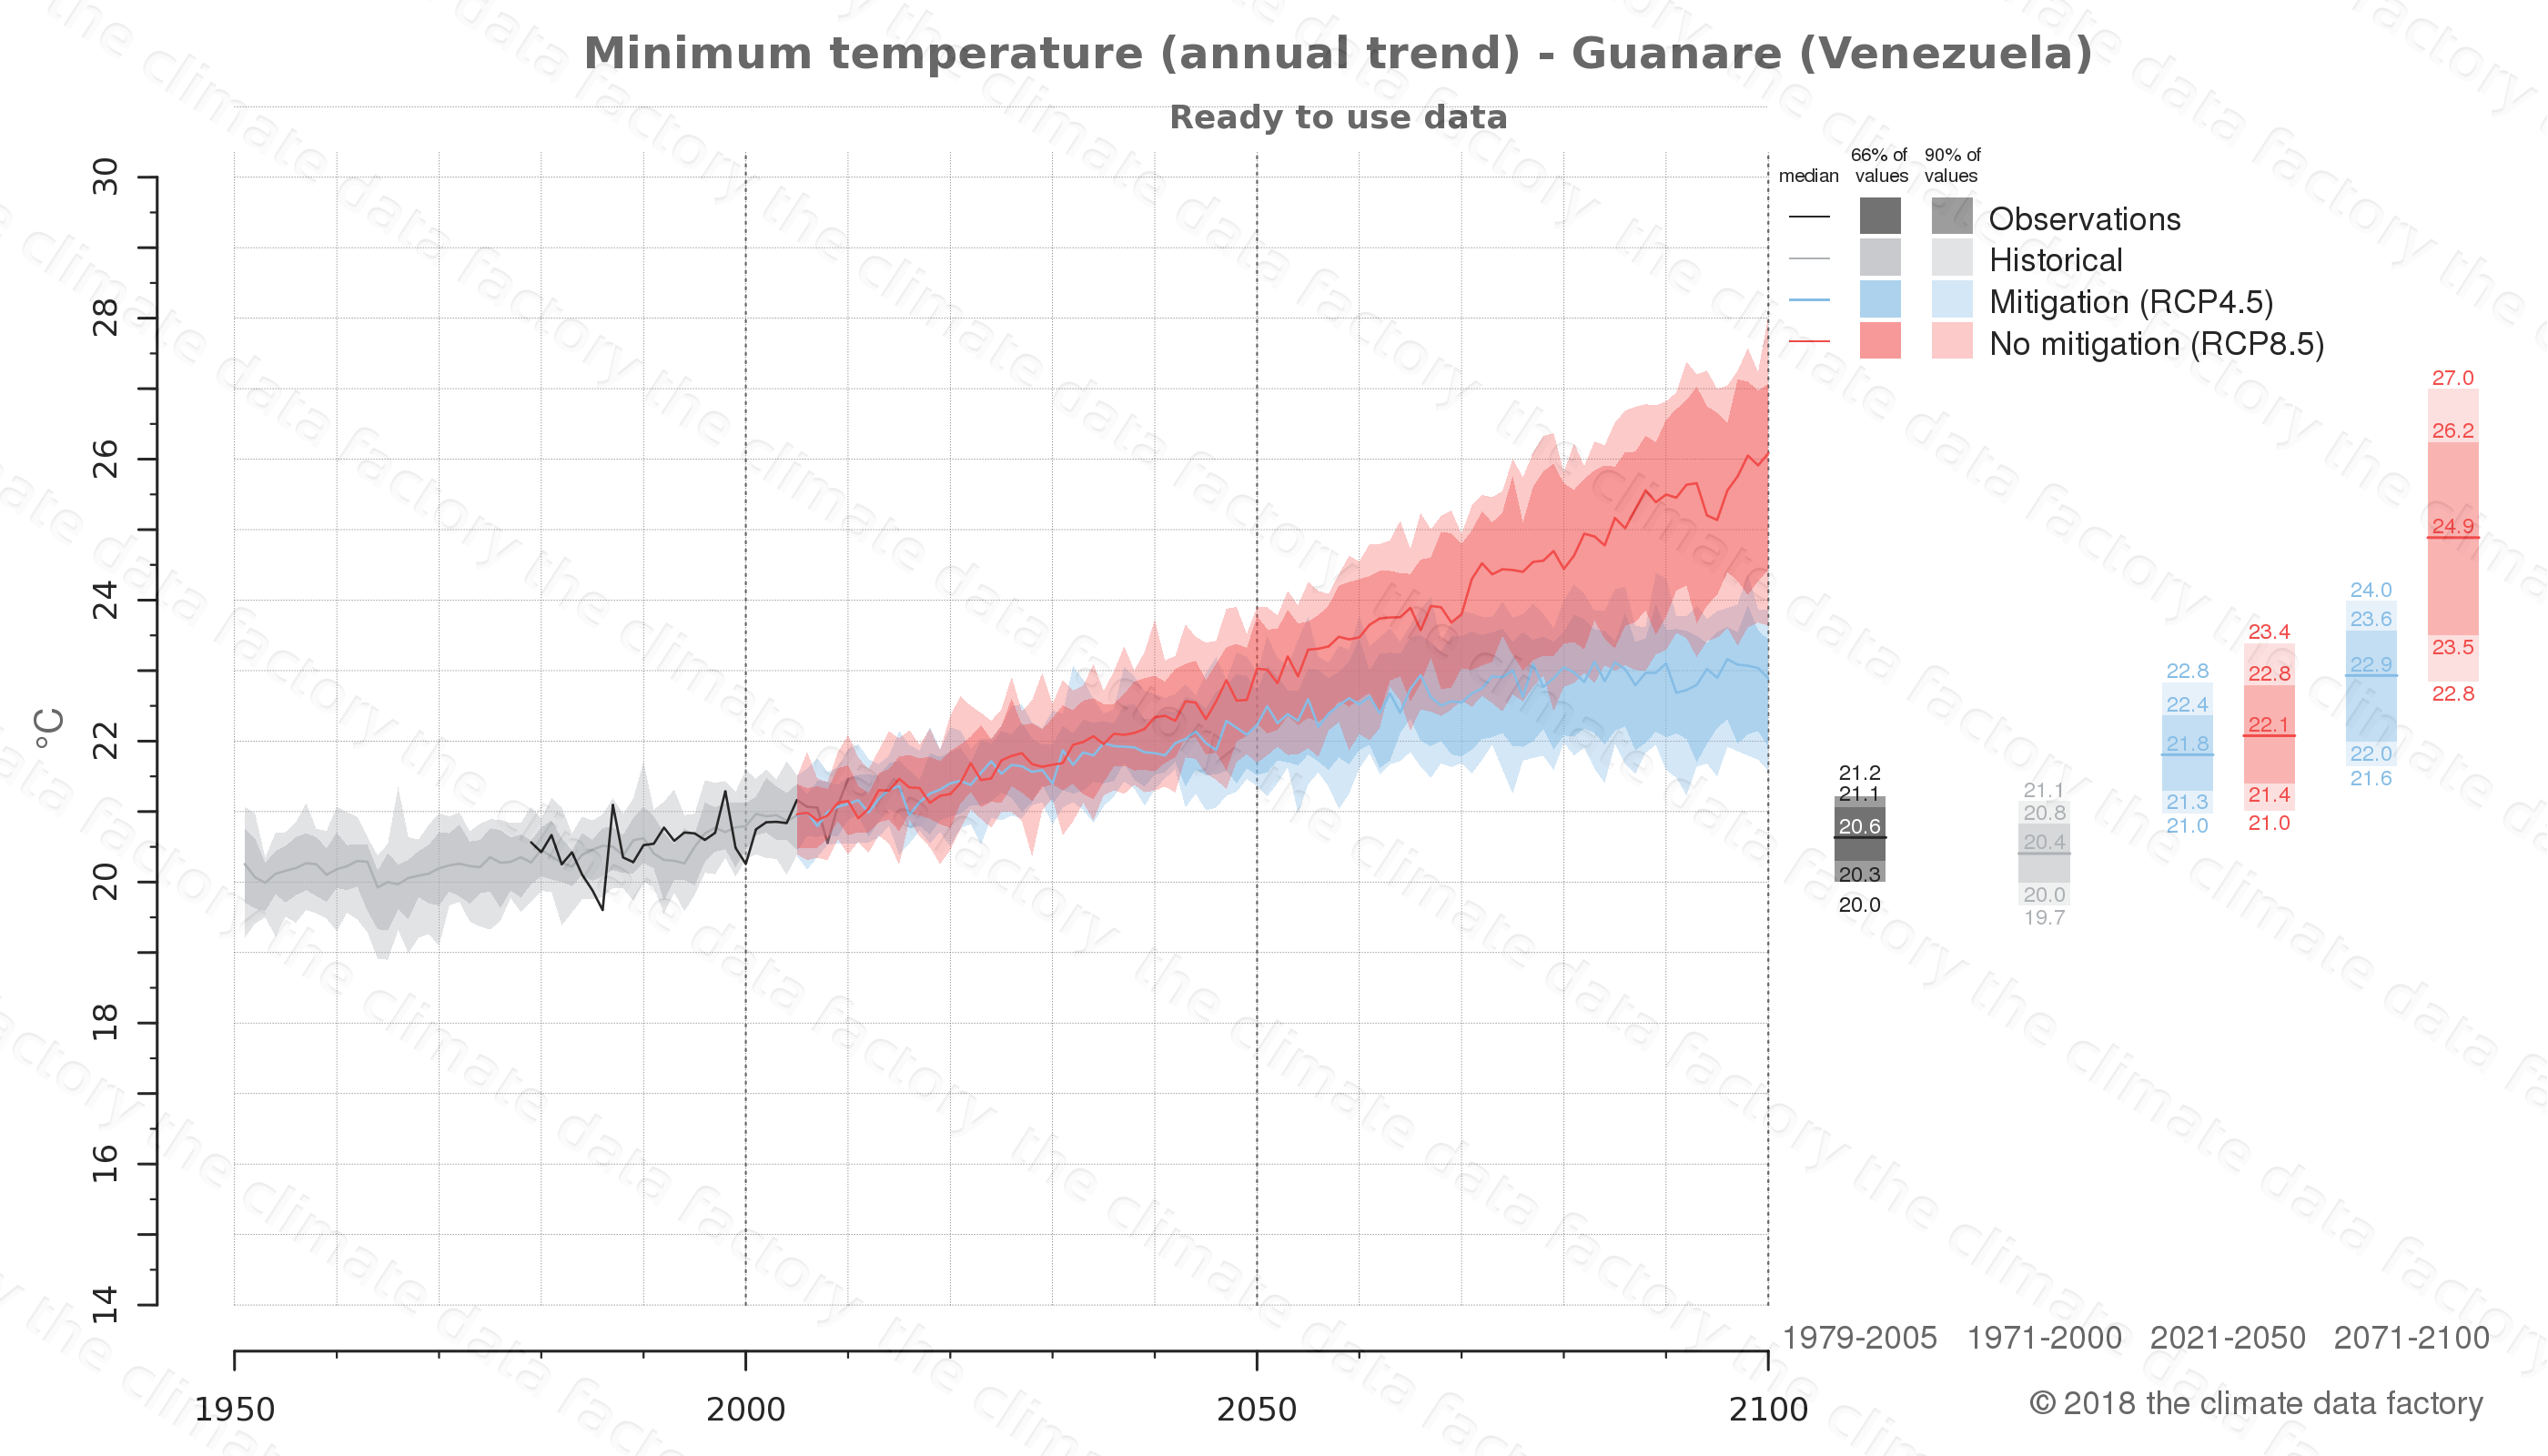 climate change data policy adaptation climate graph city data minimum-temperature guanare venezuela